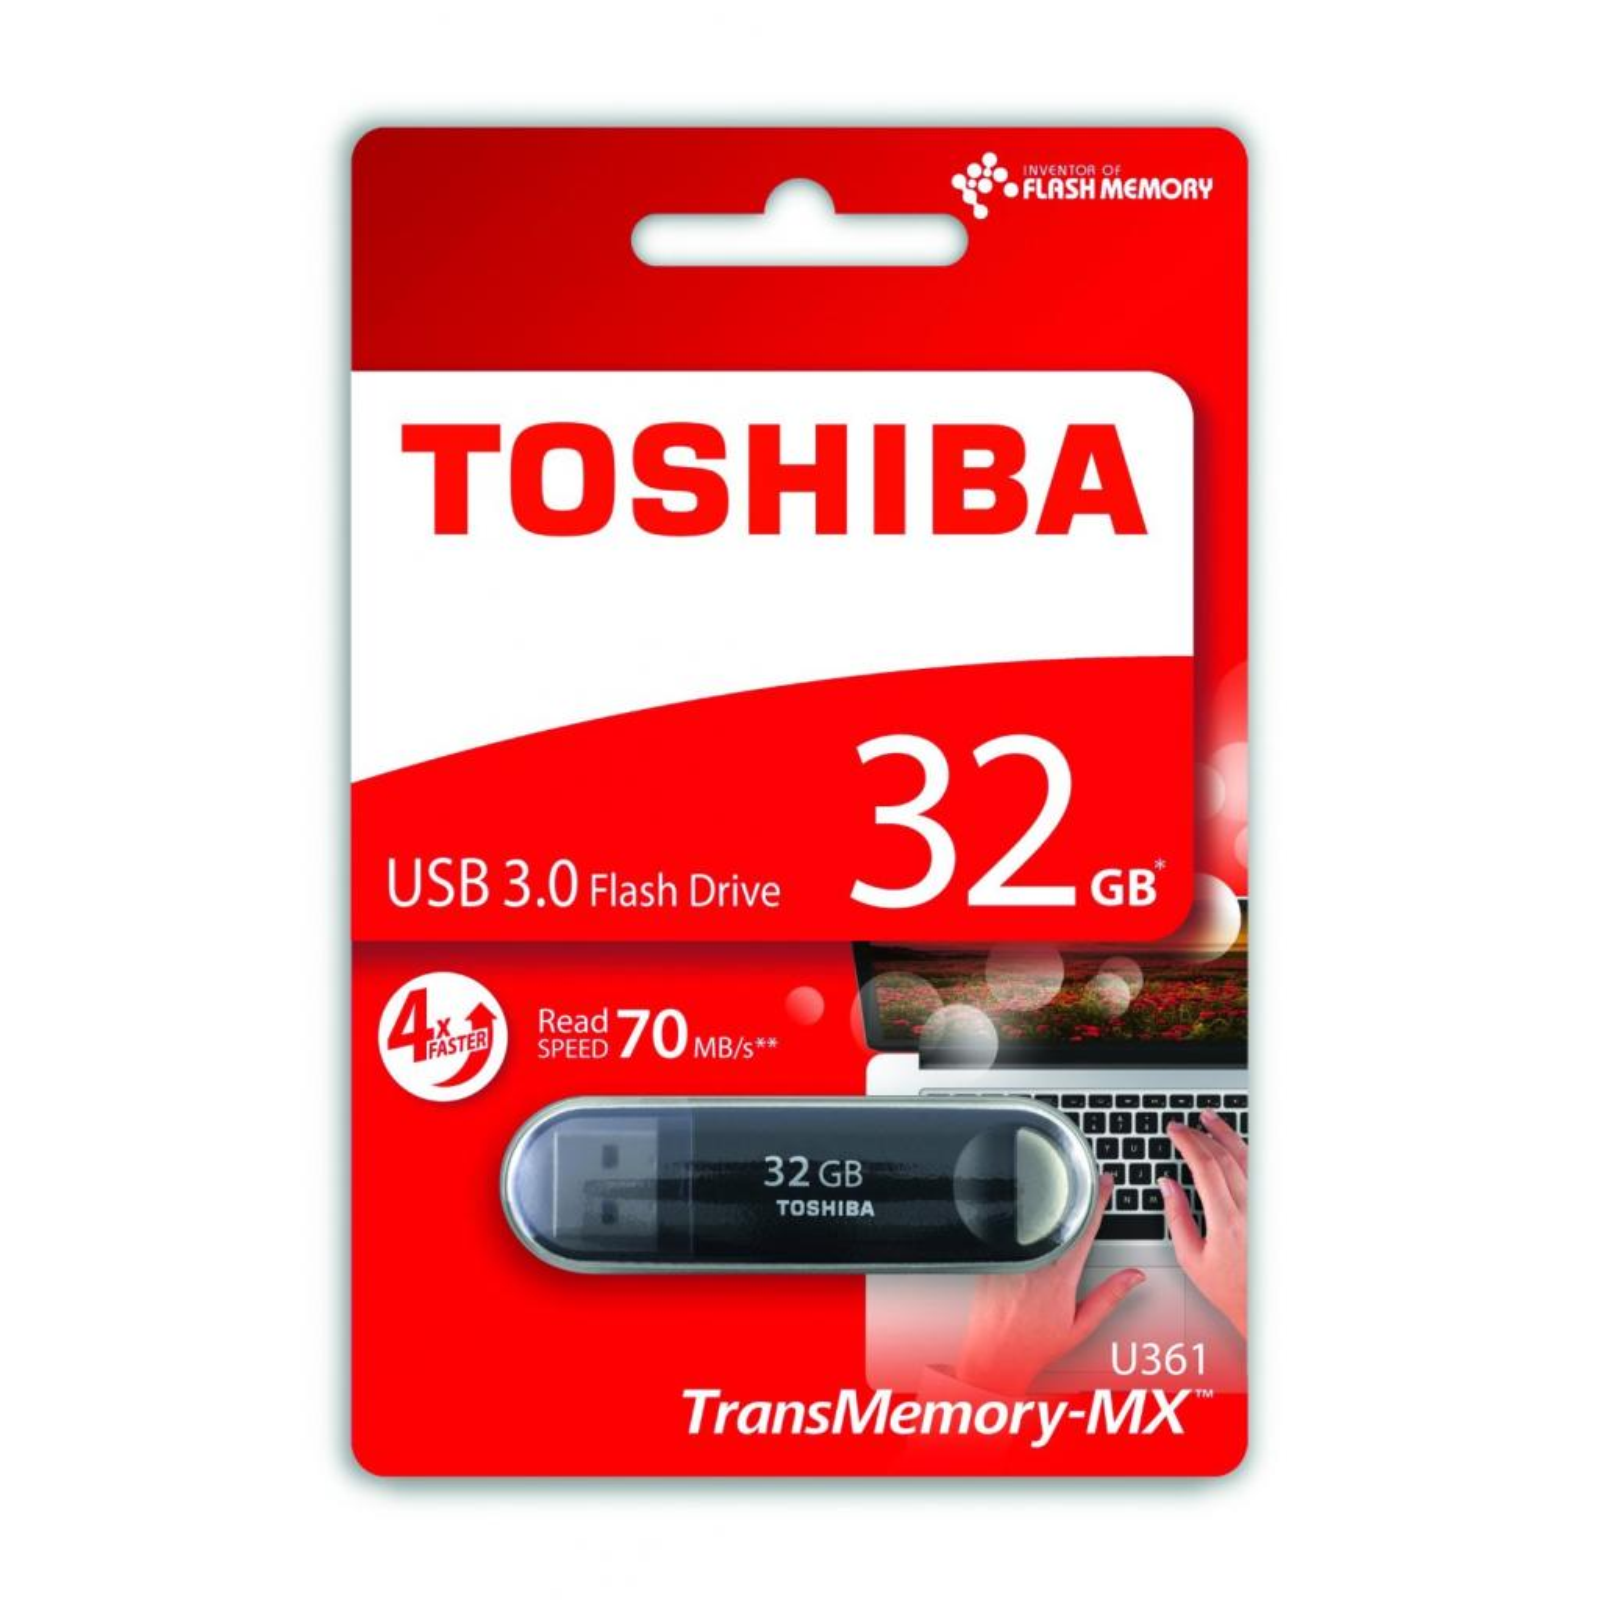 USB флеш накопитель Toshiba 32GB Suzaku Black USB 3.0 (THN-U361K0320M4) изображение 2